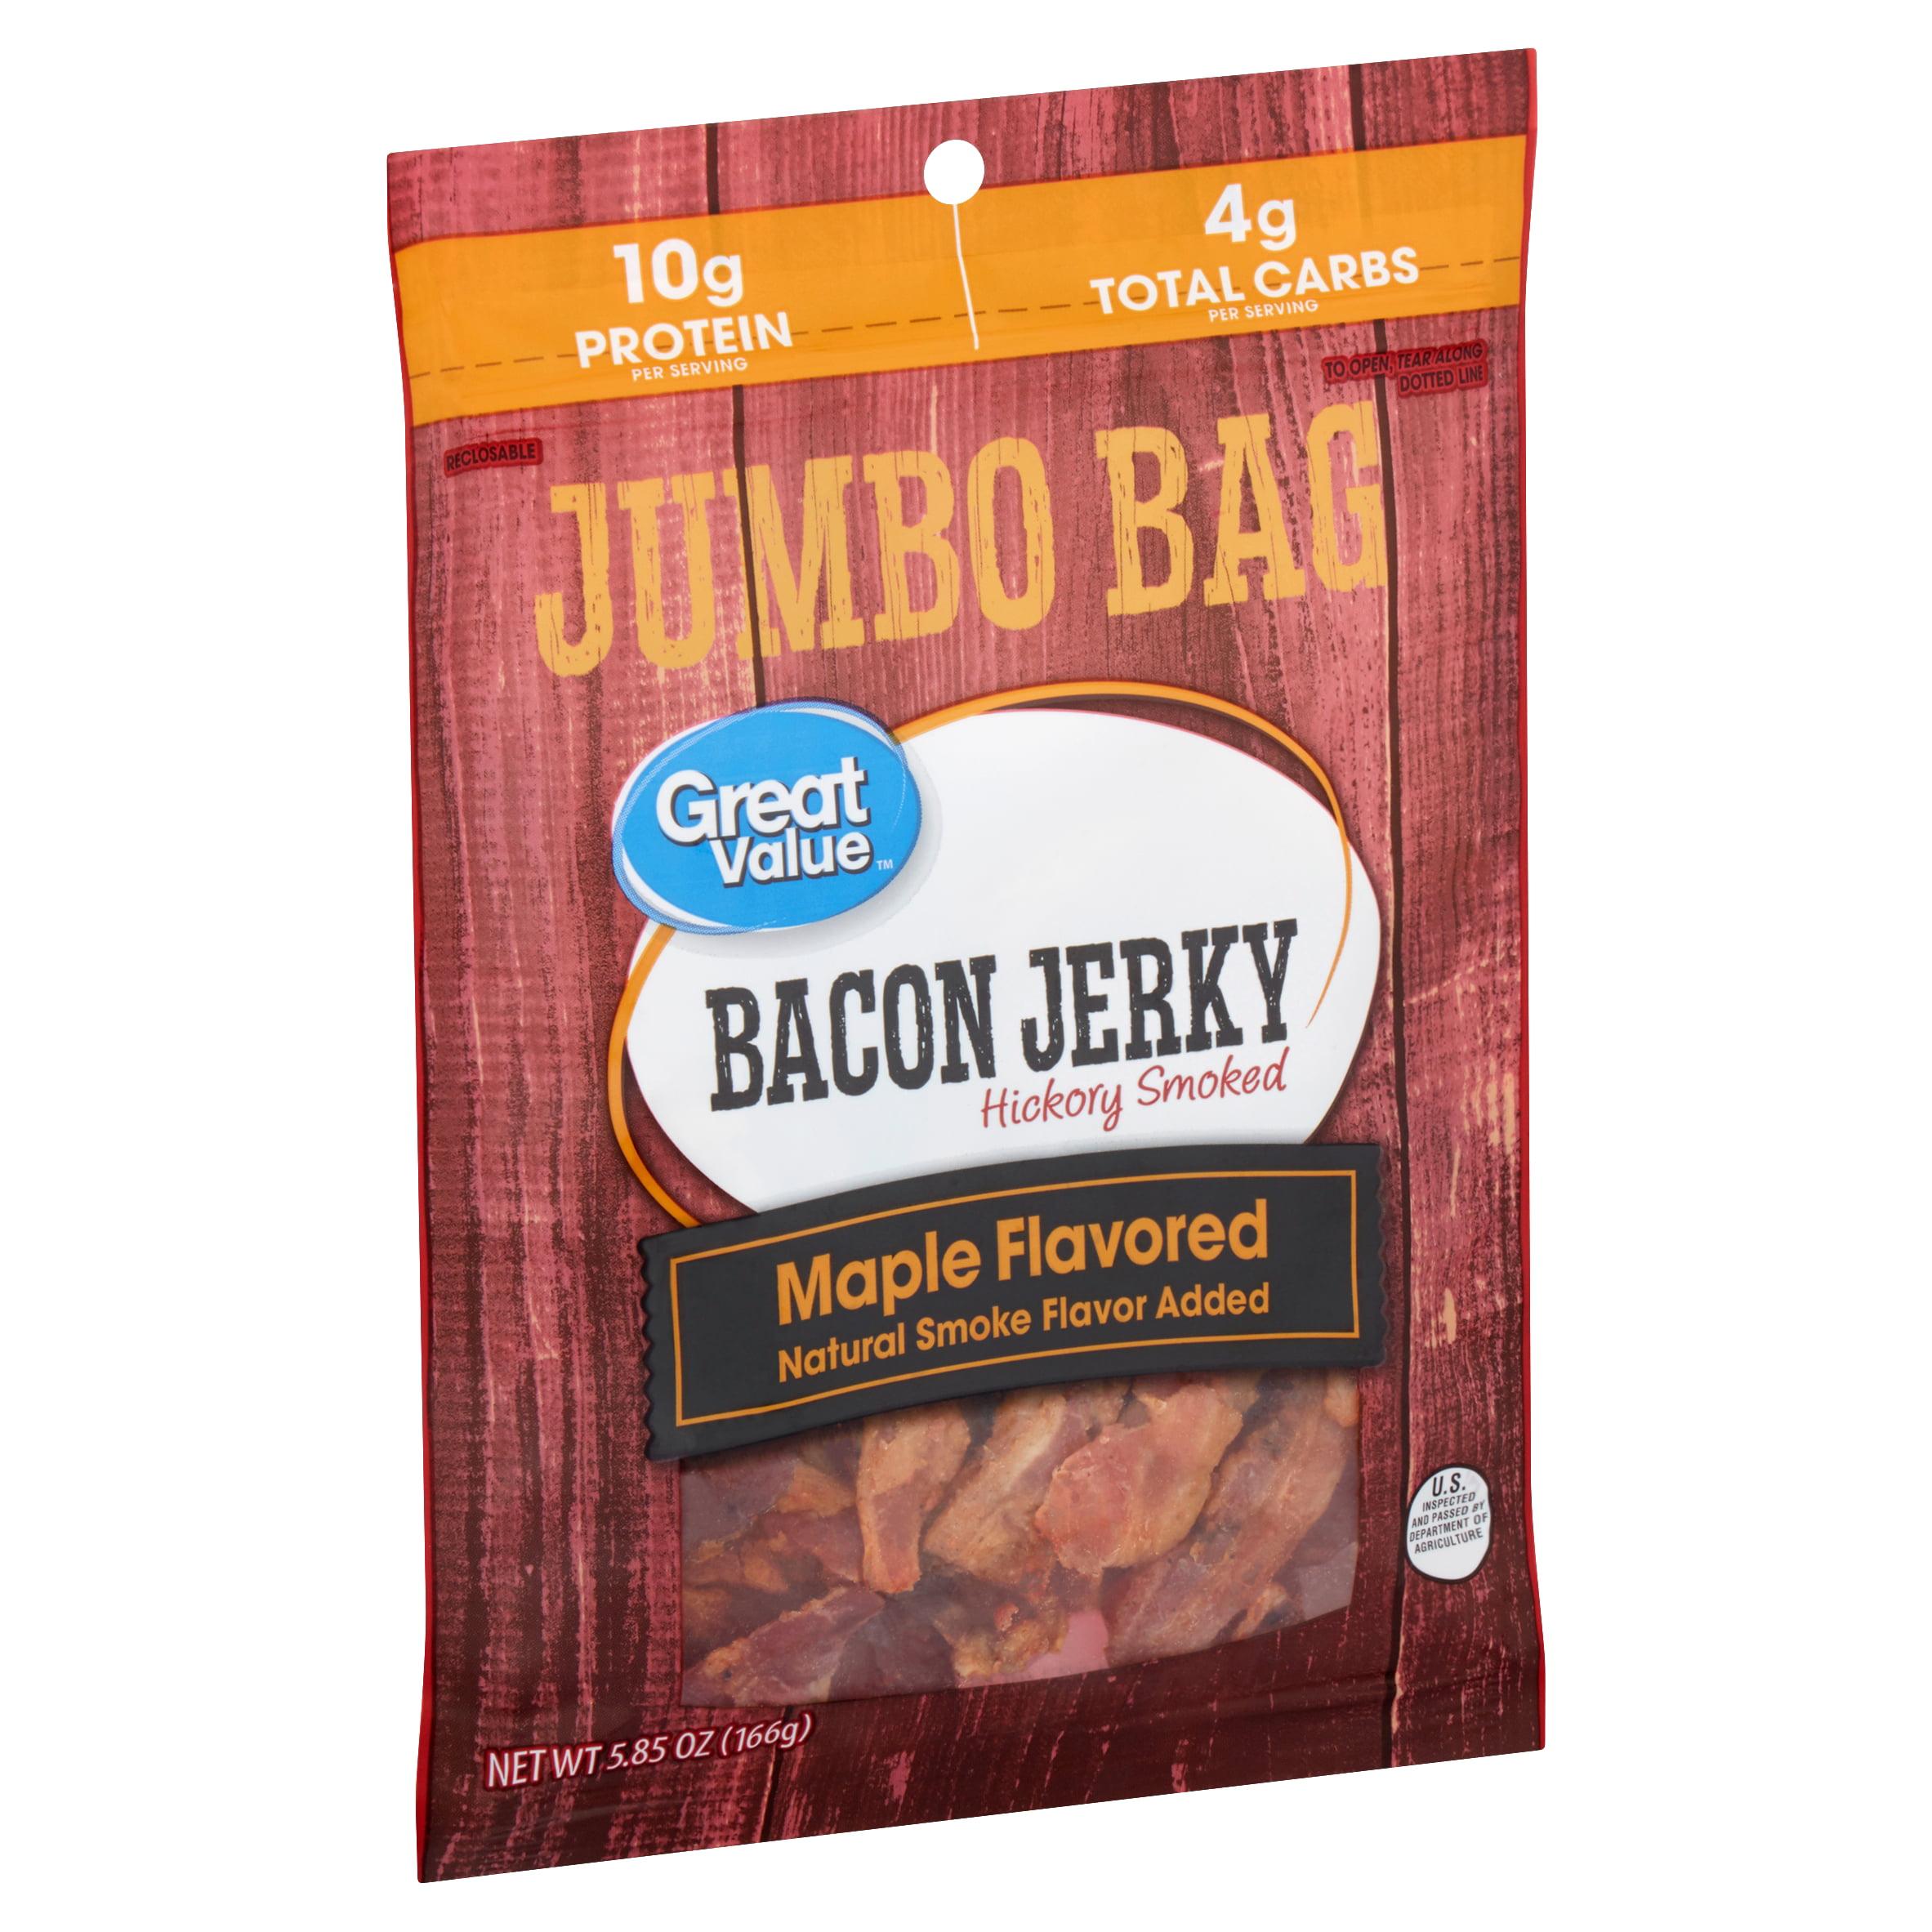 Great Value Hickory Smoked Maple Flavored Bacon Jerky Jumbo Bag, 5.85 Oz.